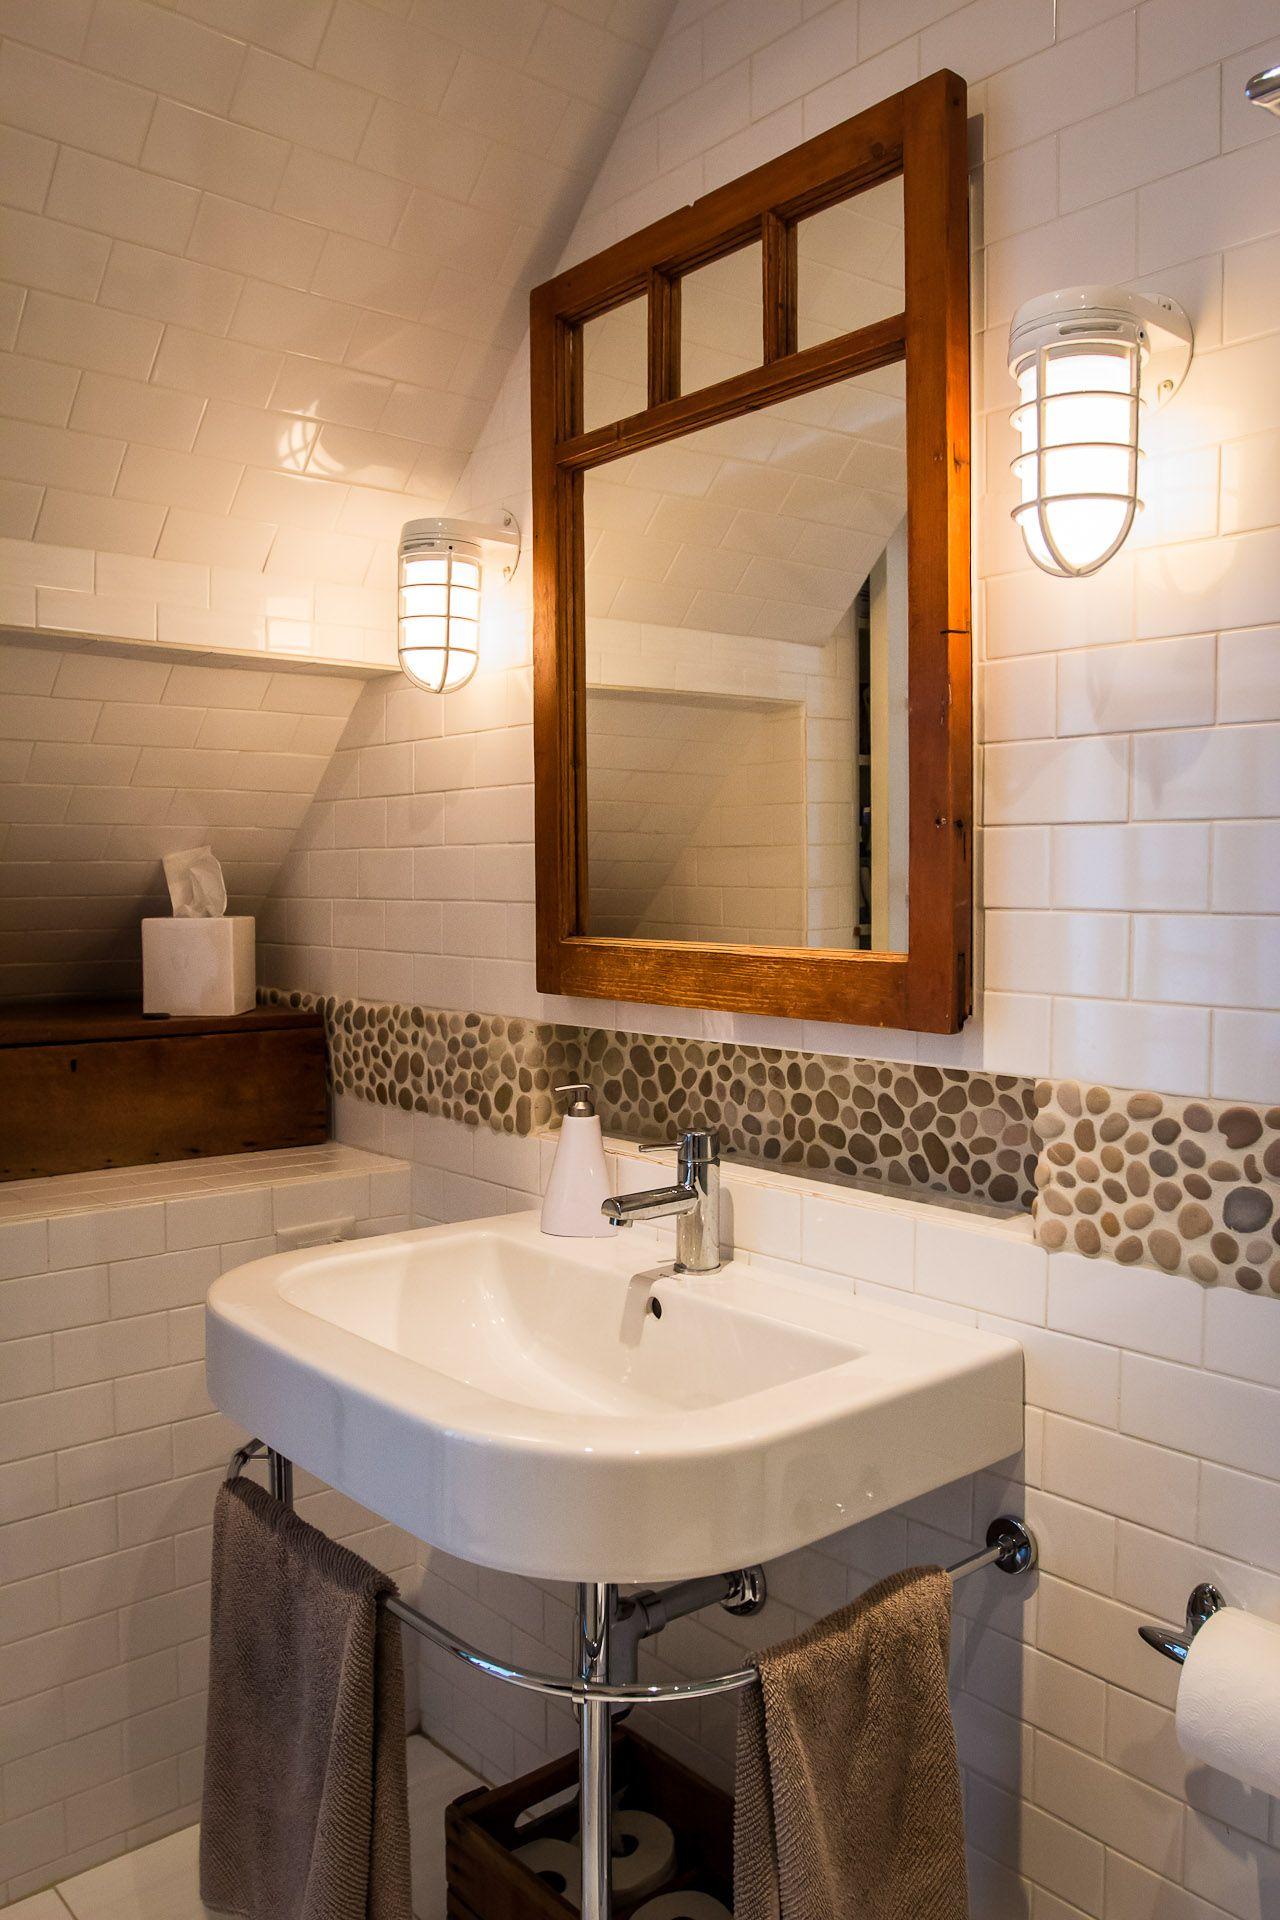 Tracey rob 39 s beach oasis pebble tiles subway tiles for Small bathroom oasis